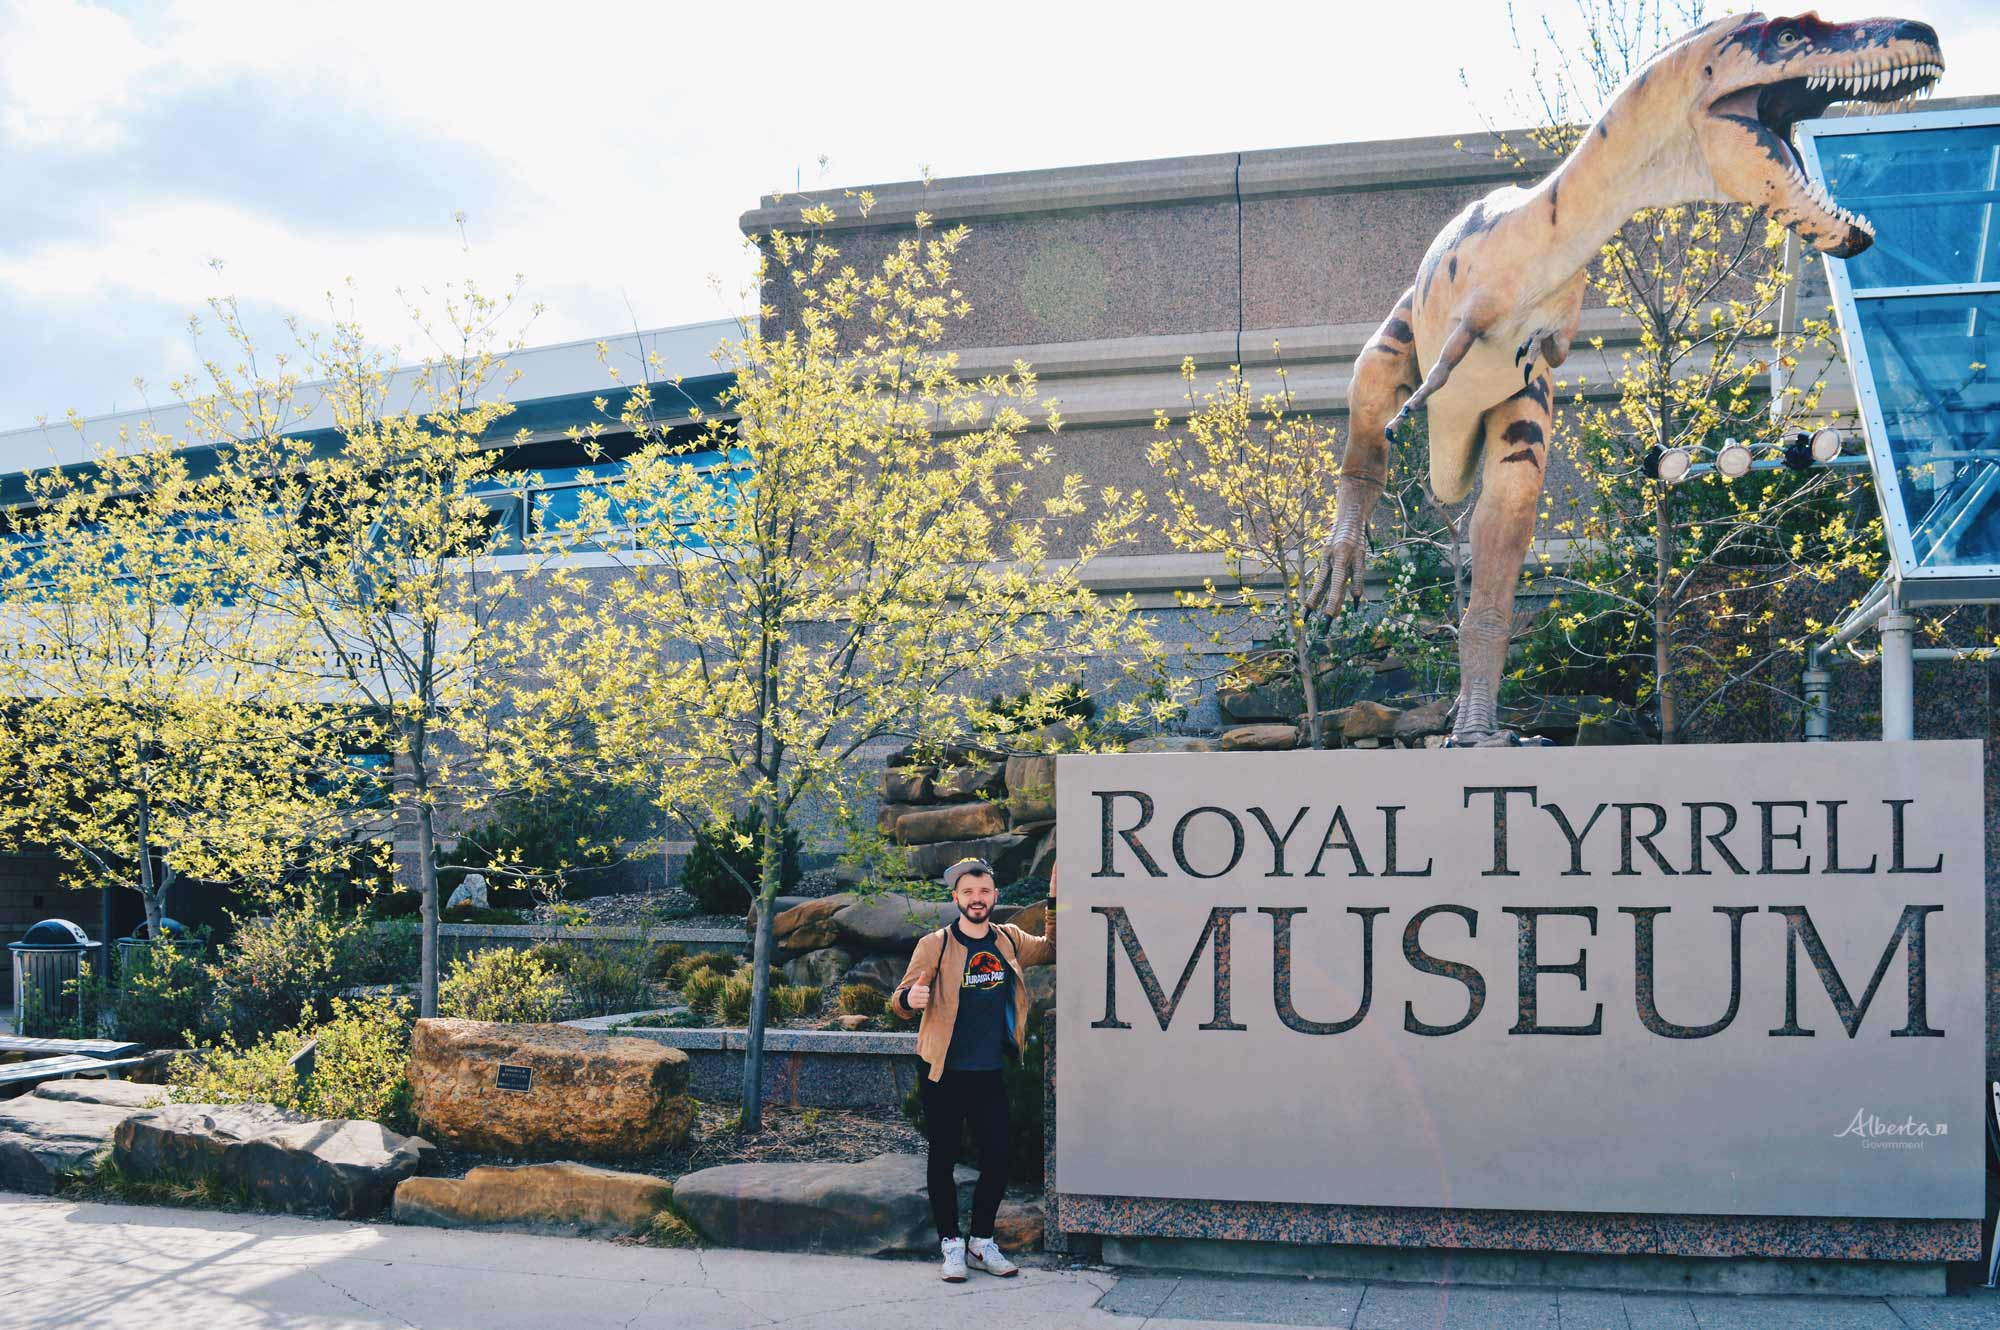 Dinosaurs Royal Tyrrell Museum Palaeontology Drumheller Alberta Canada © CoupleofMen.com